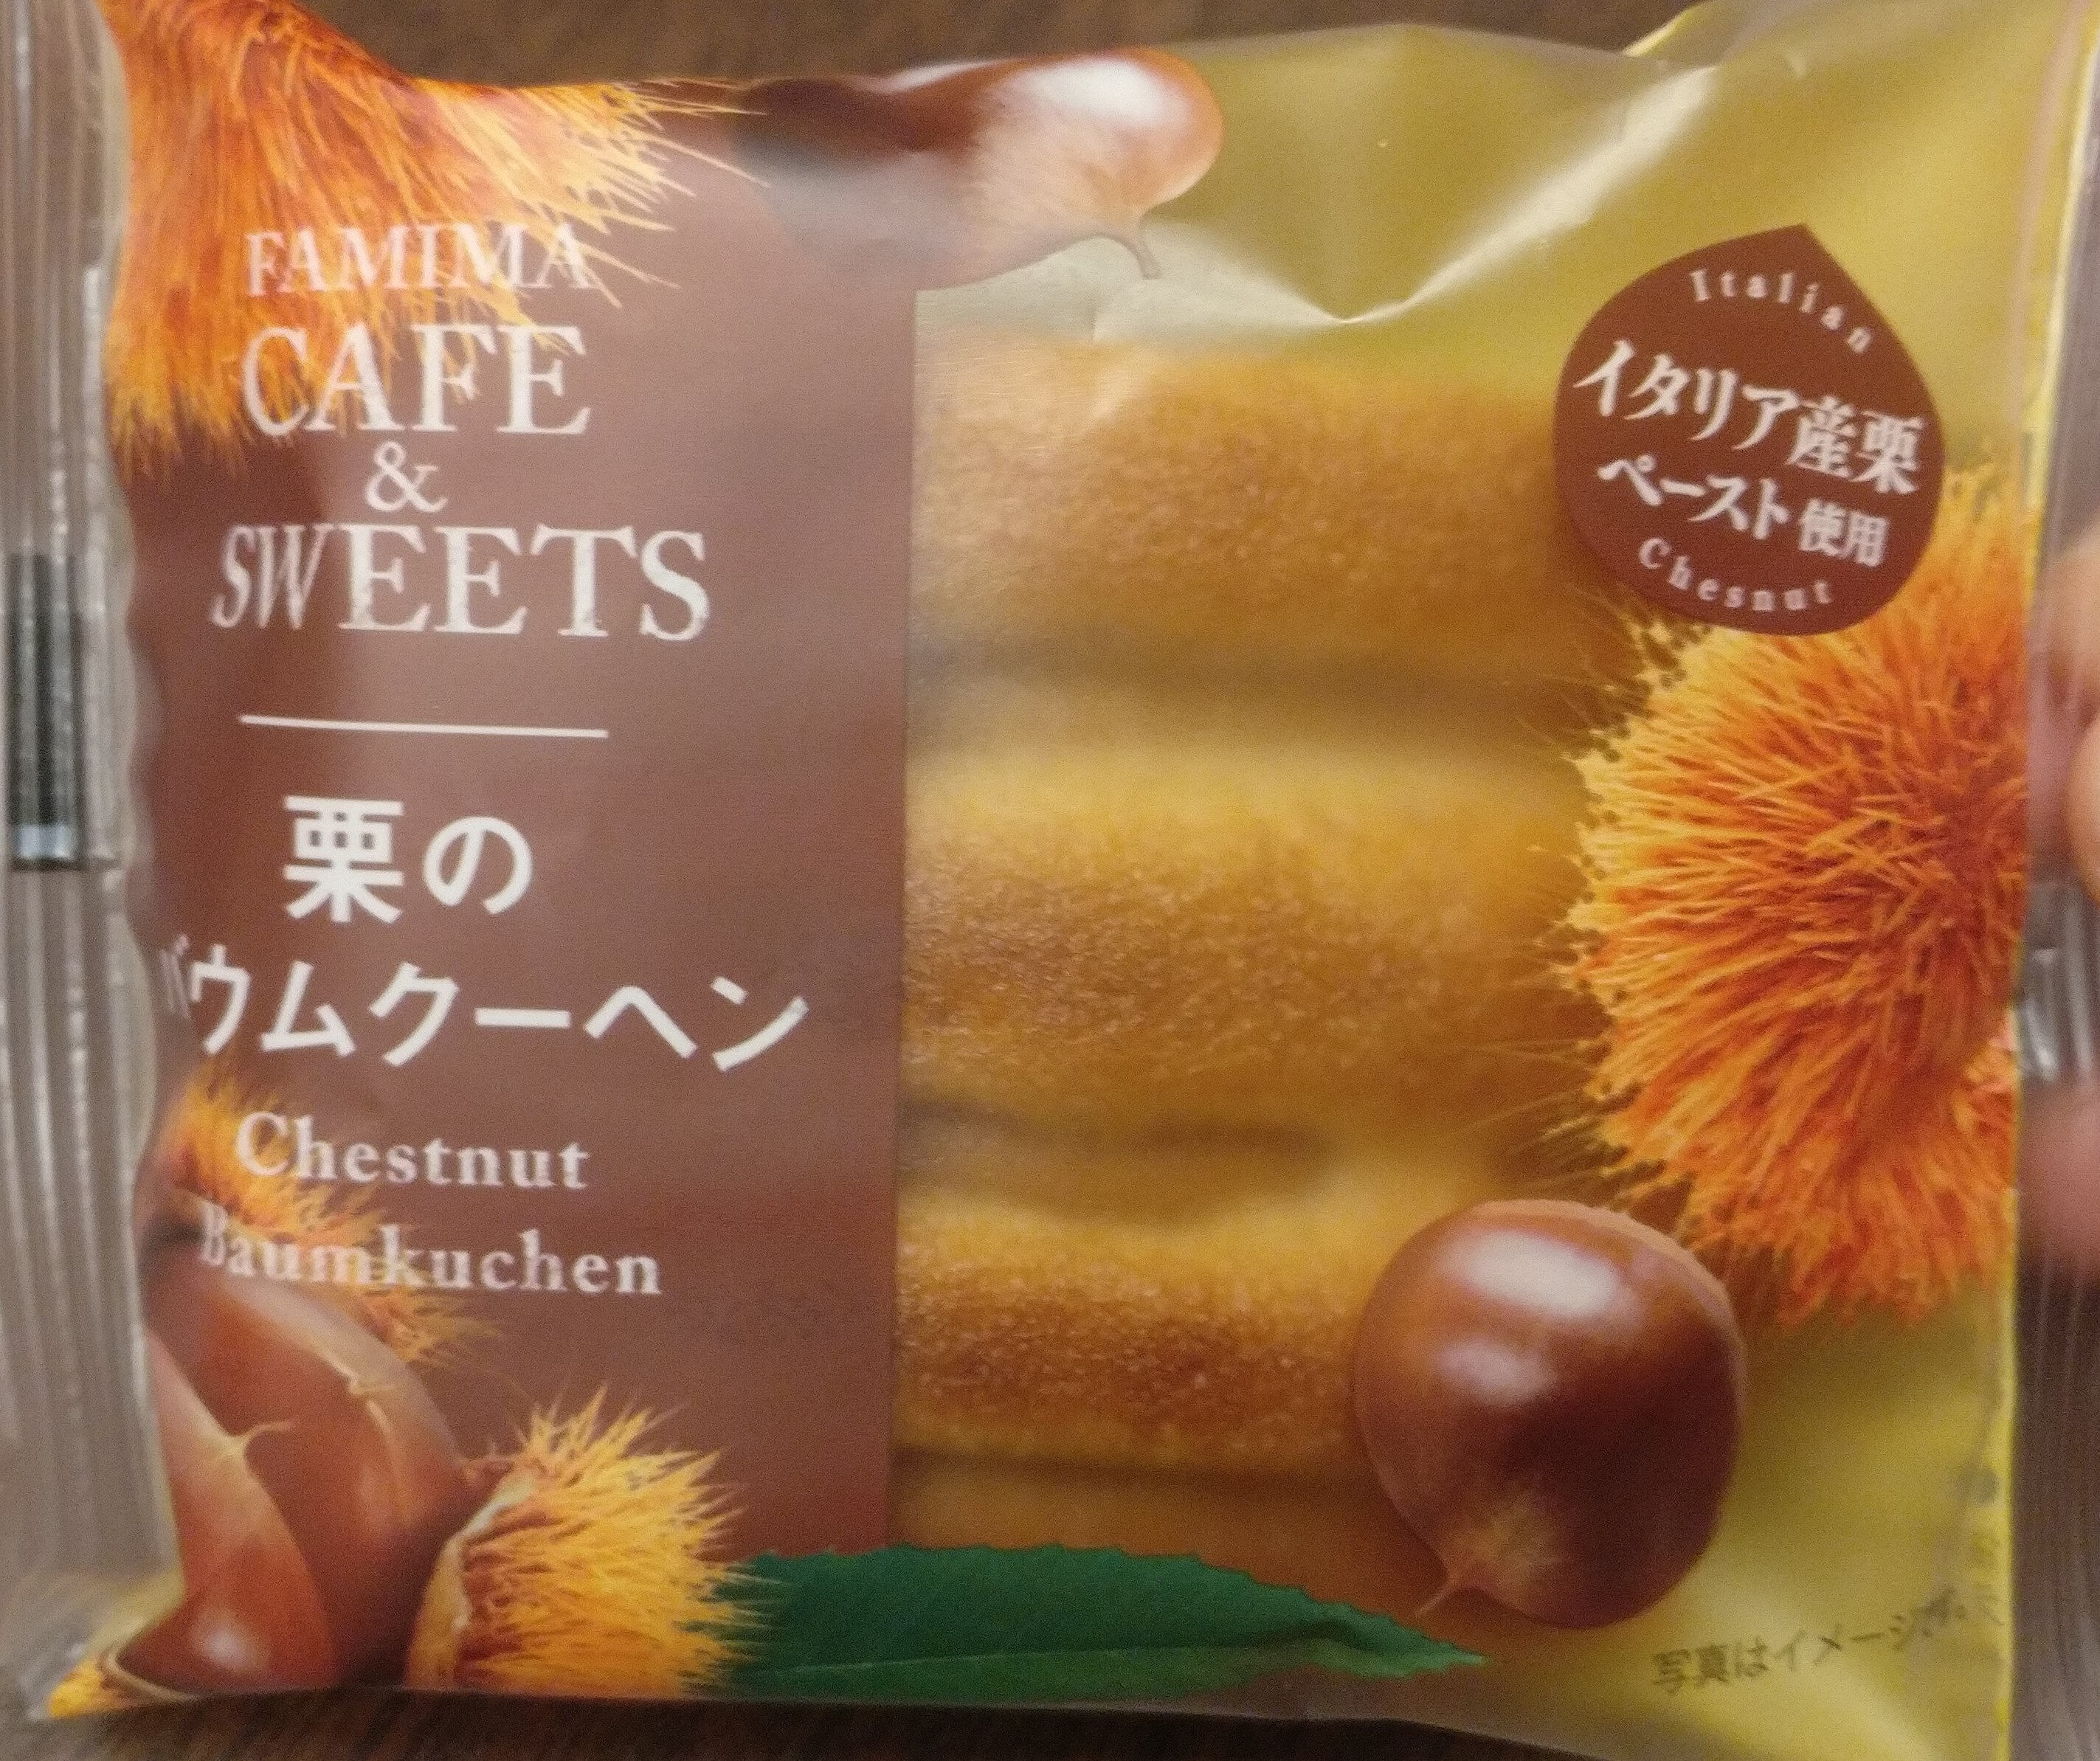 Chestnut Baumkuchen - Product - en